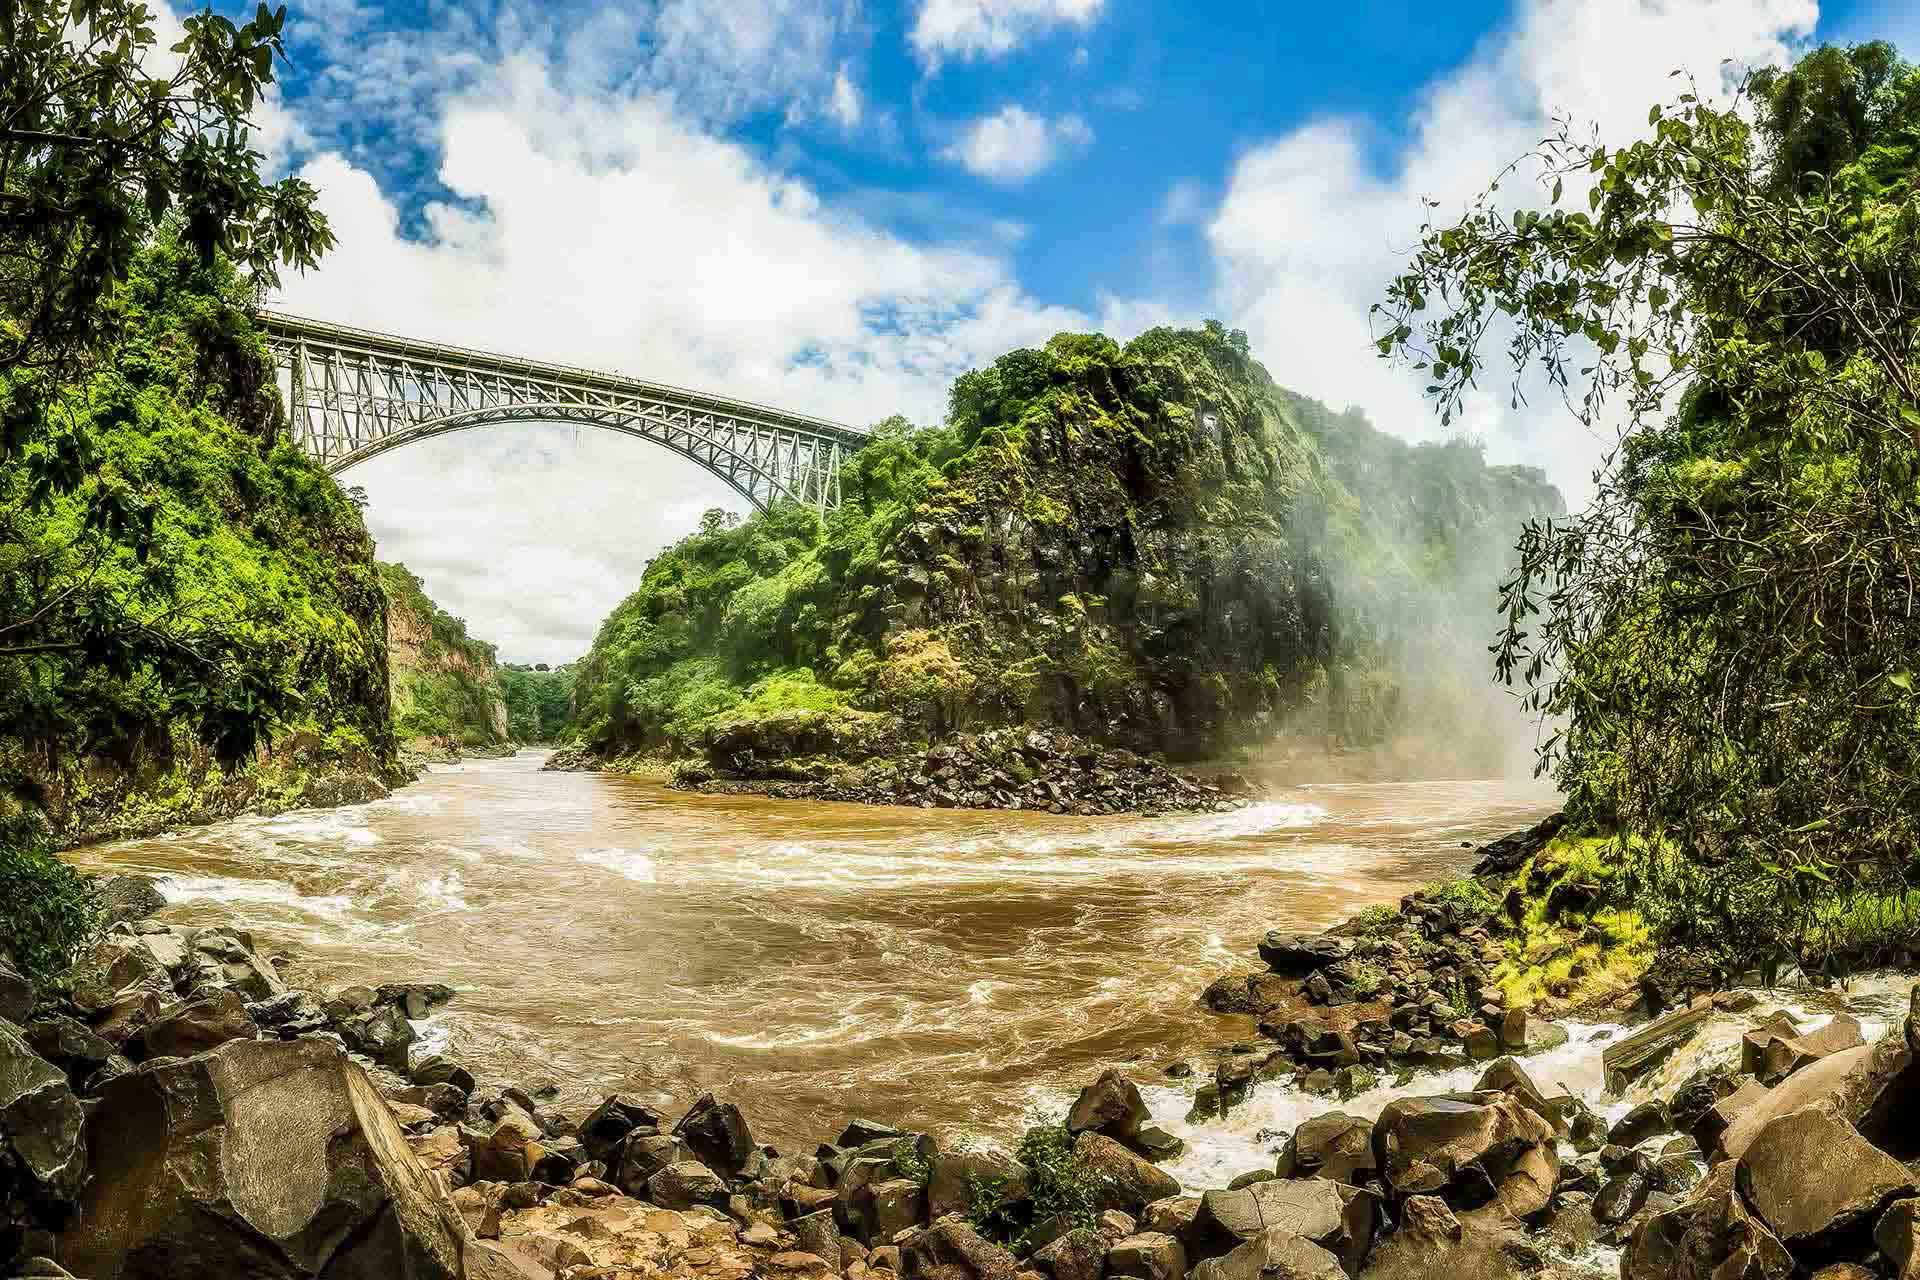 The famous bridge at AVANI Victoria falls